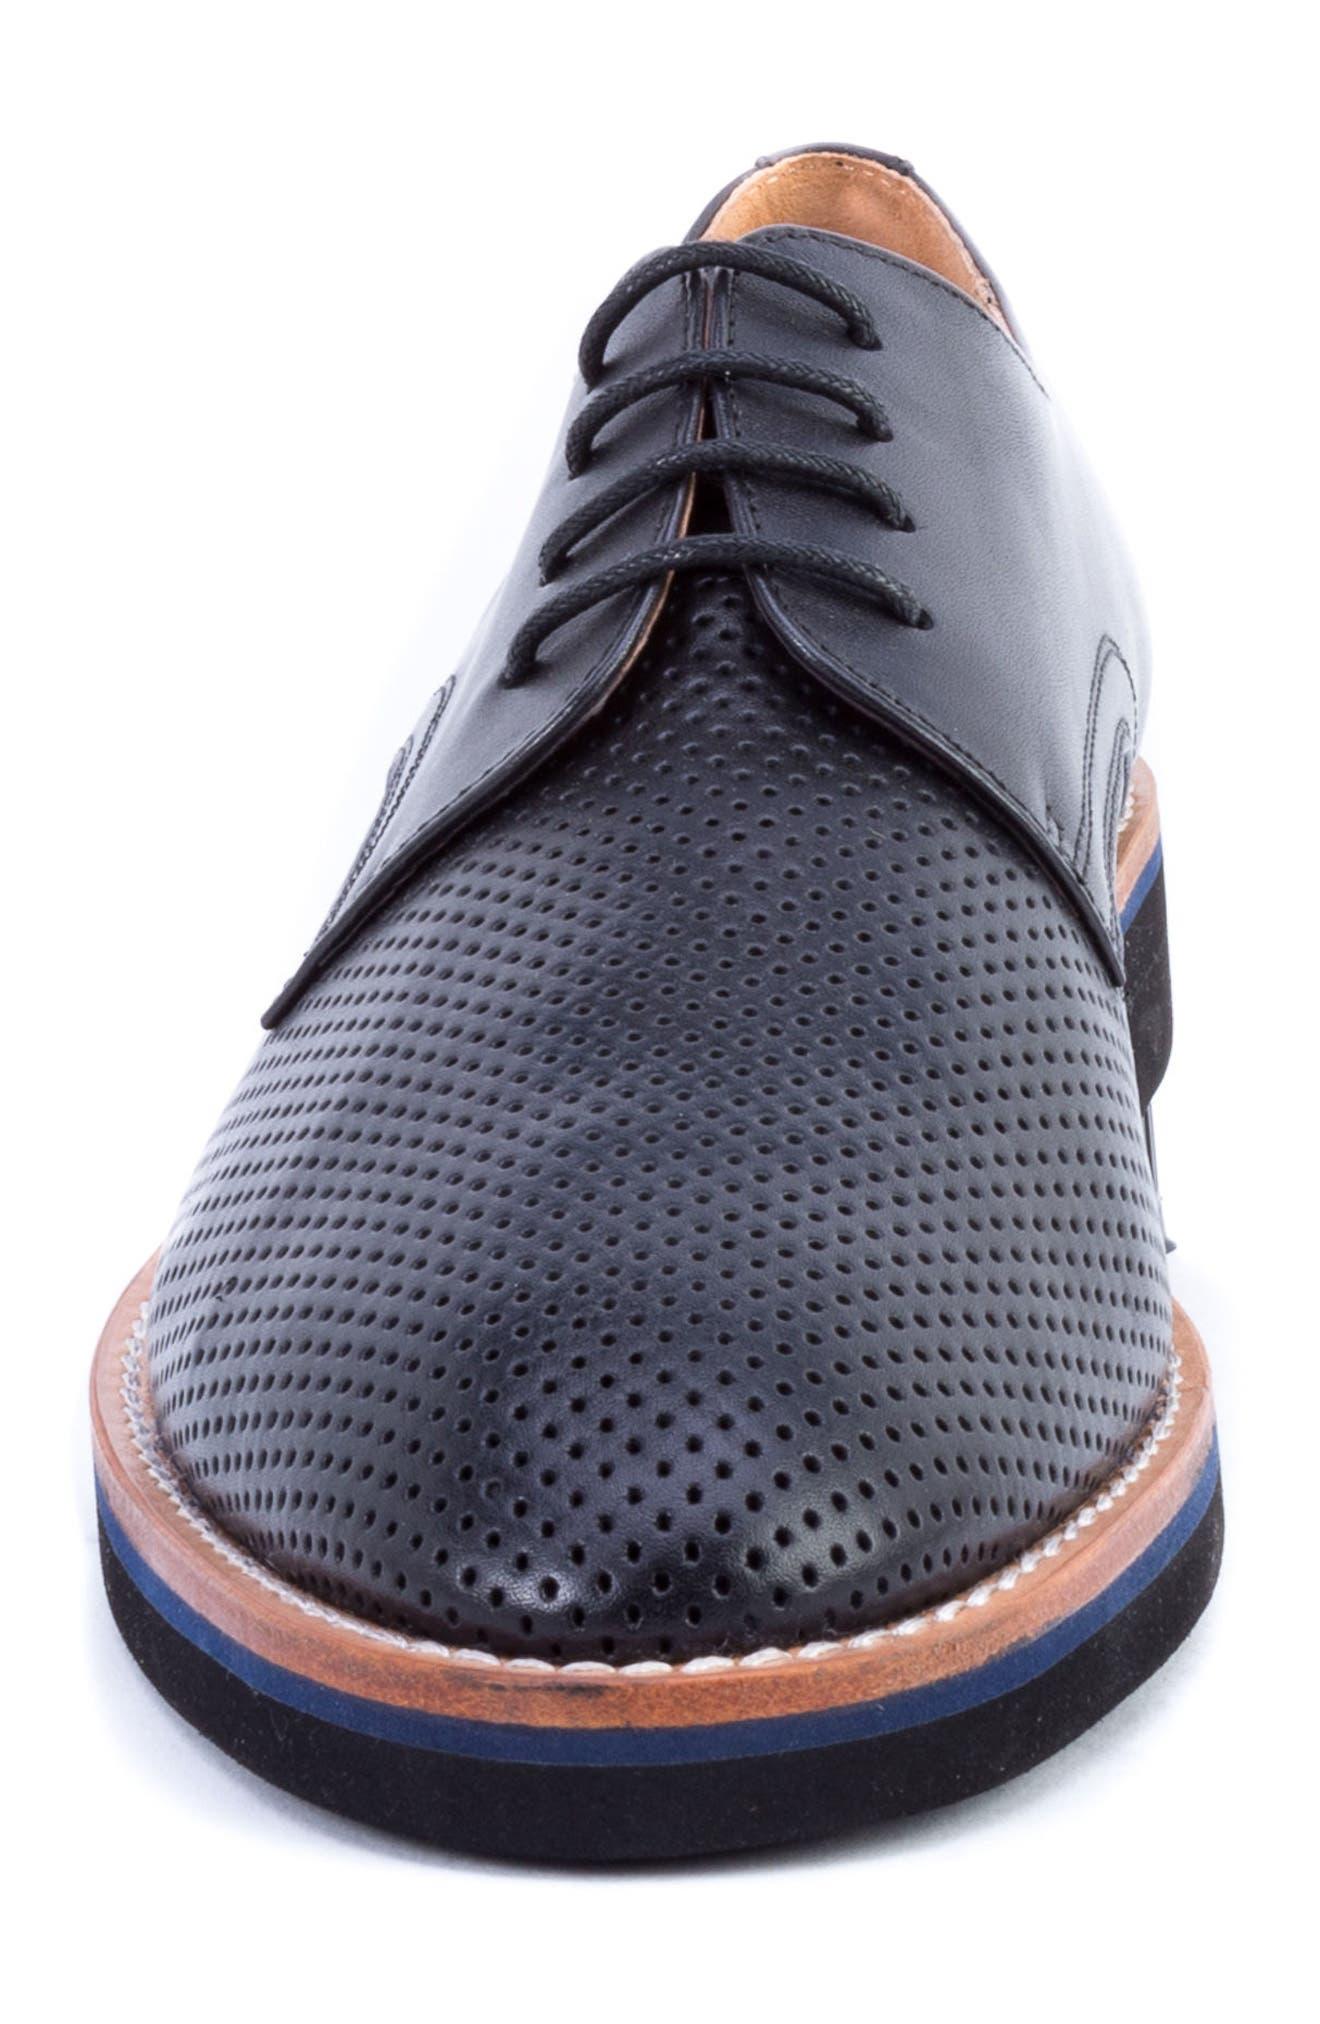 Alternate Image 4  - Zanzara Hartung Perforated Plain Toe Derby (Men)